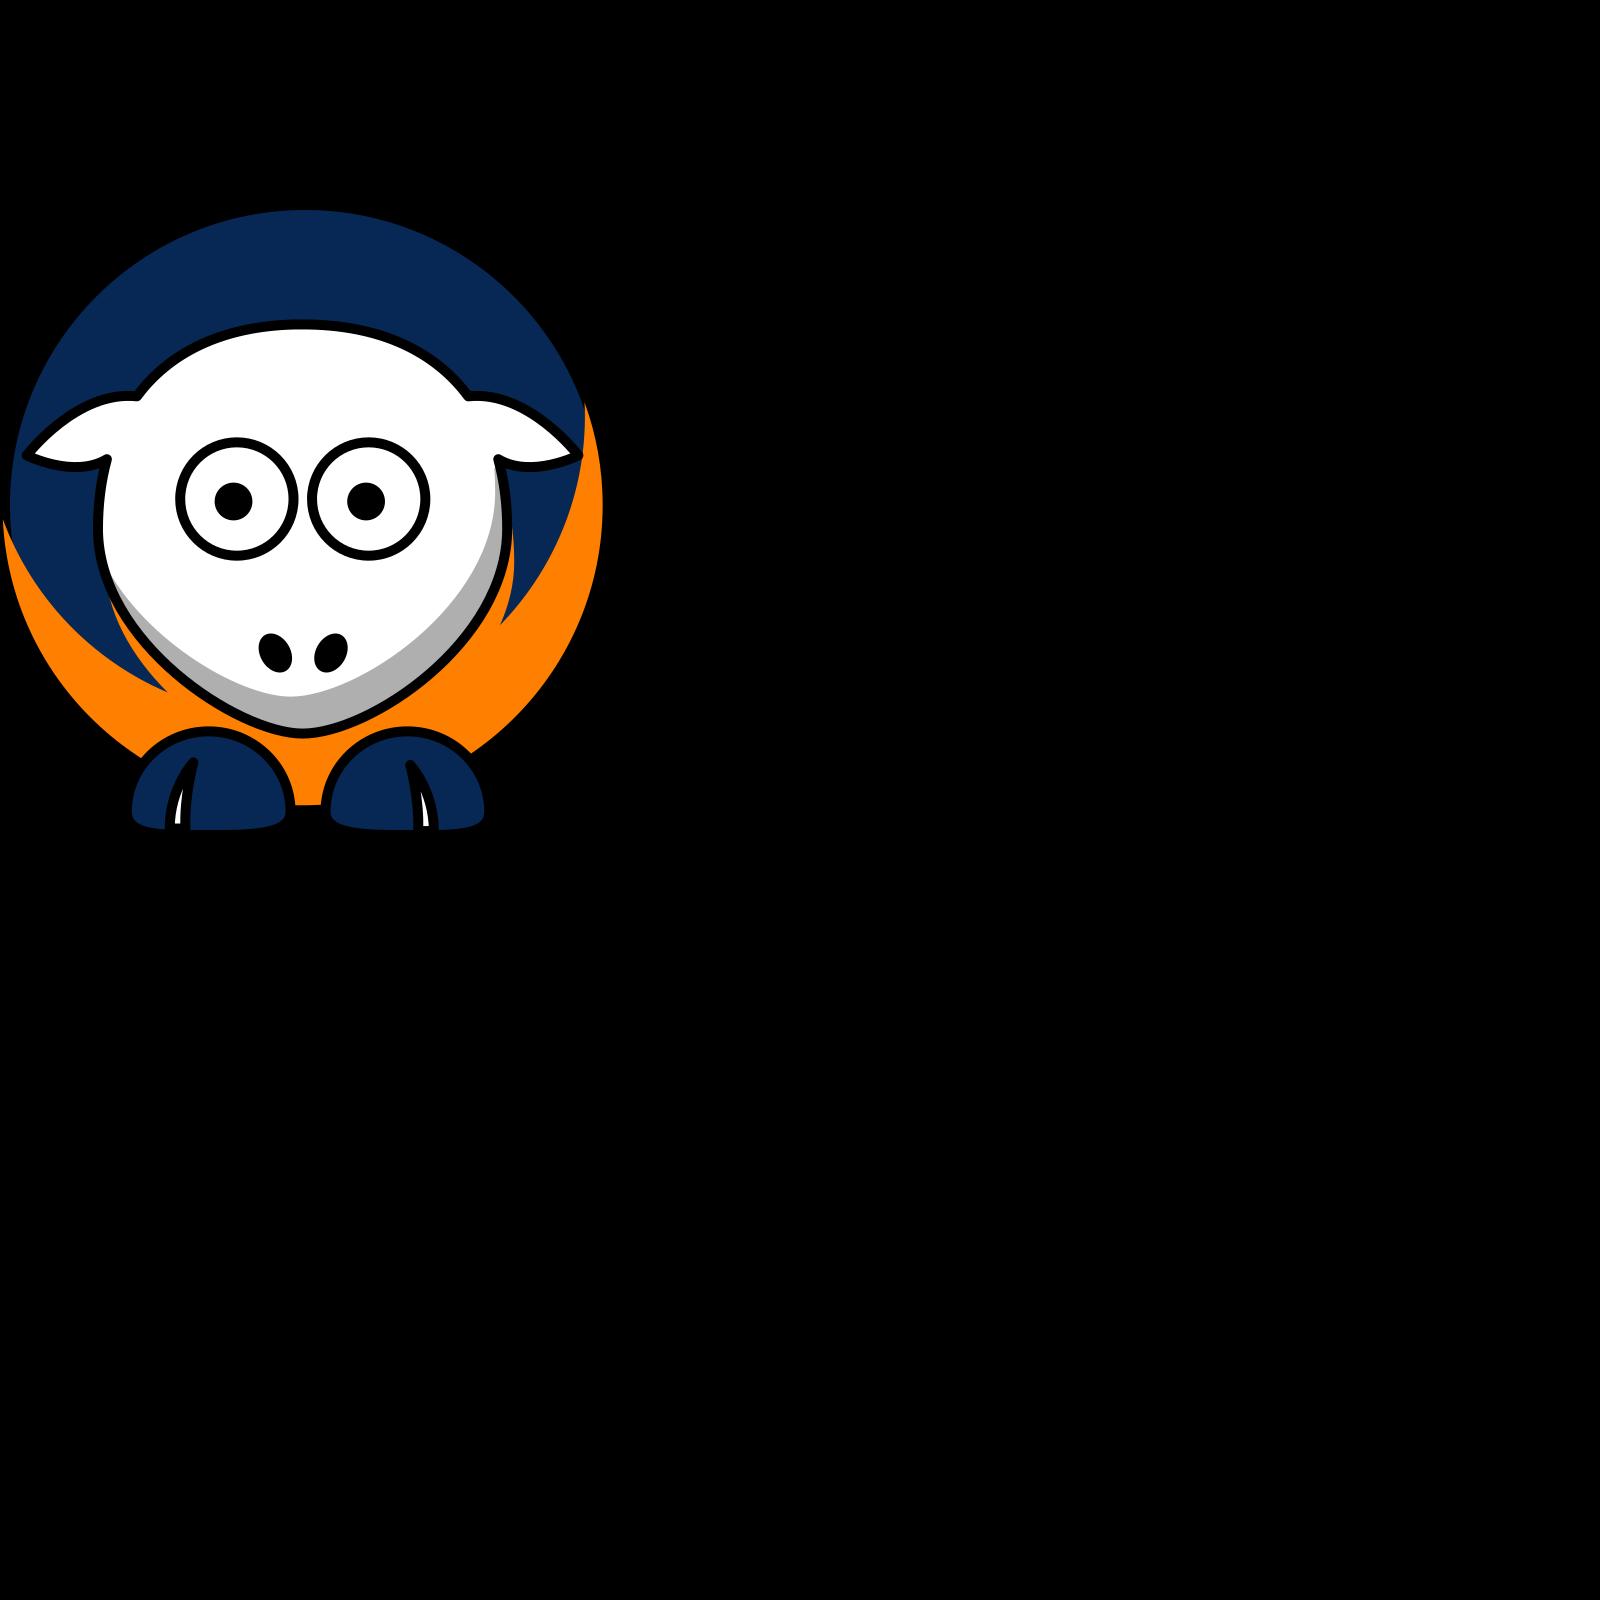 Astros Clip Art >> Sheep Houston Astros Team Colors Clip Art Icon And Svg